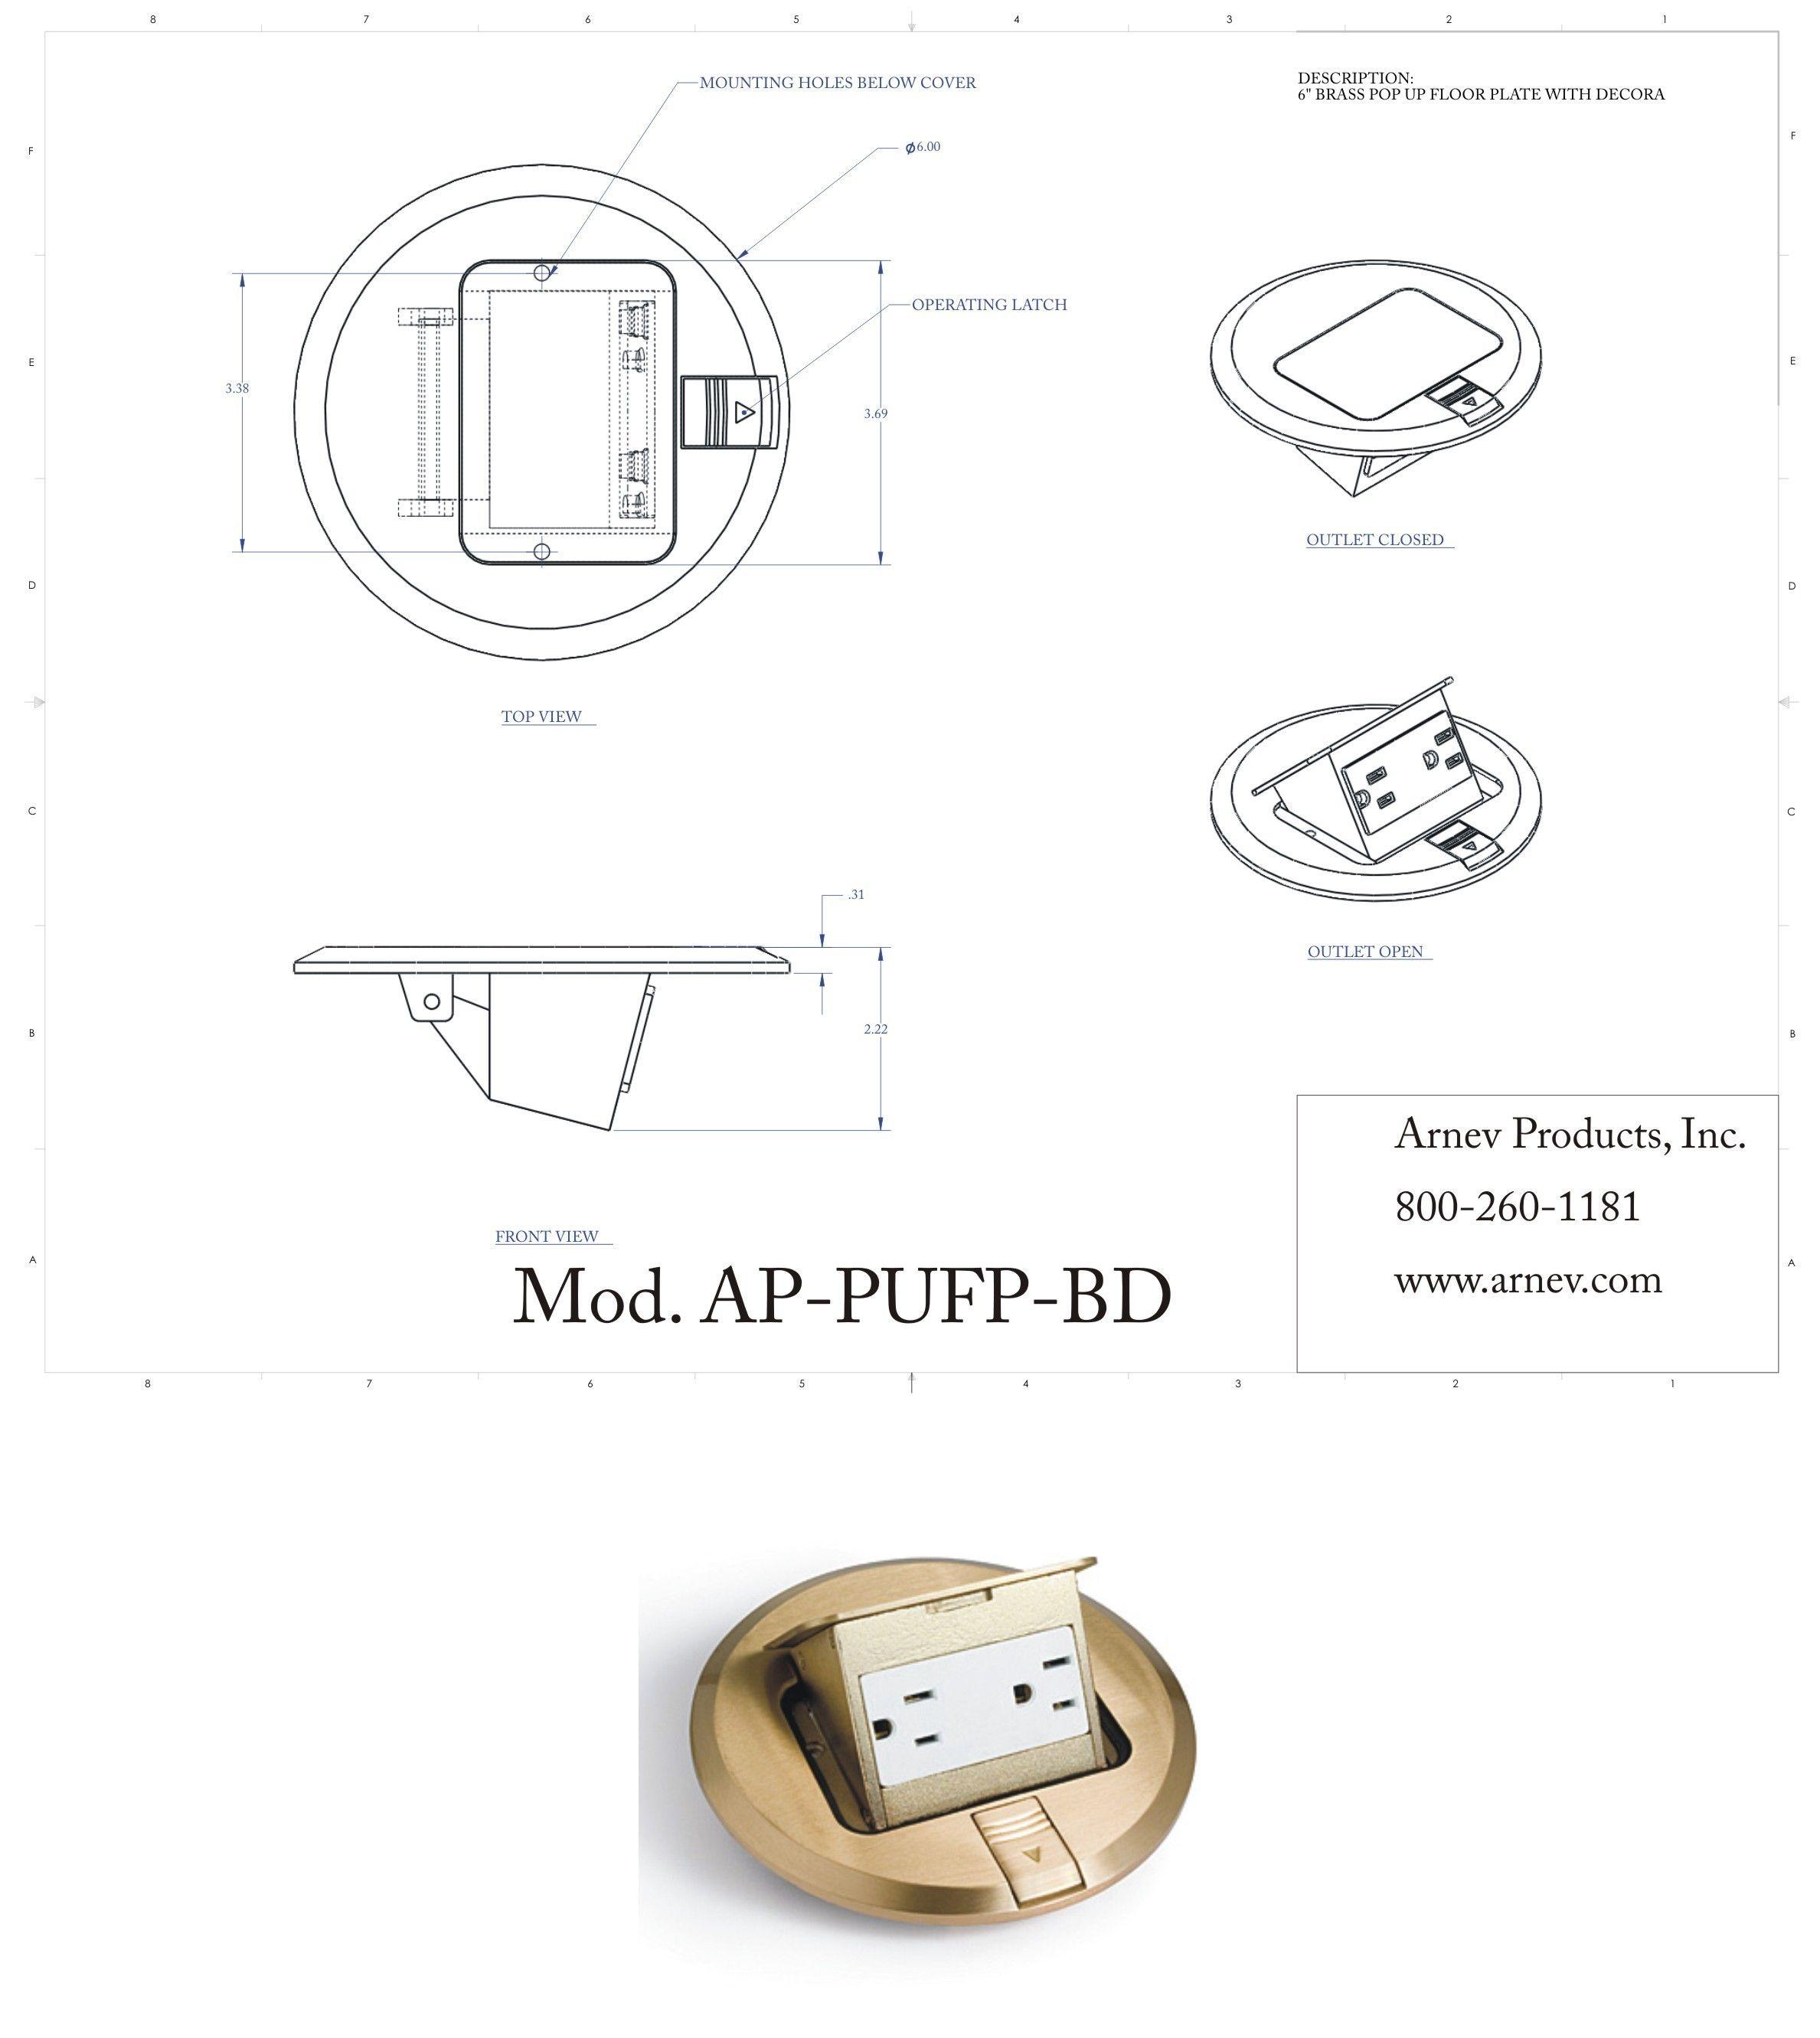 floors square concrete box hubbell bdcutsheet bd floor for sheet pufp electrical outlet ap cut boxes